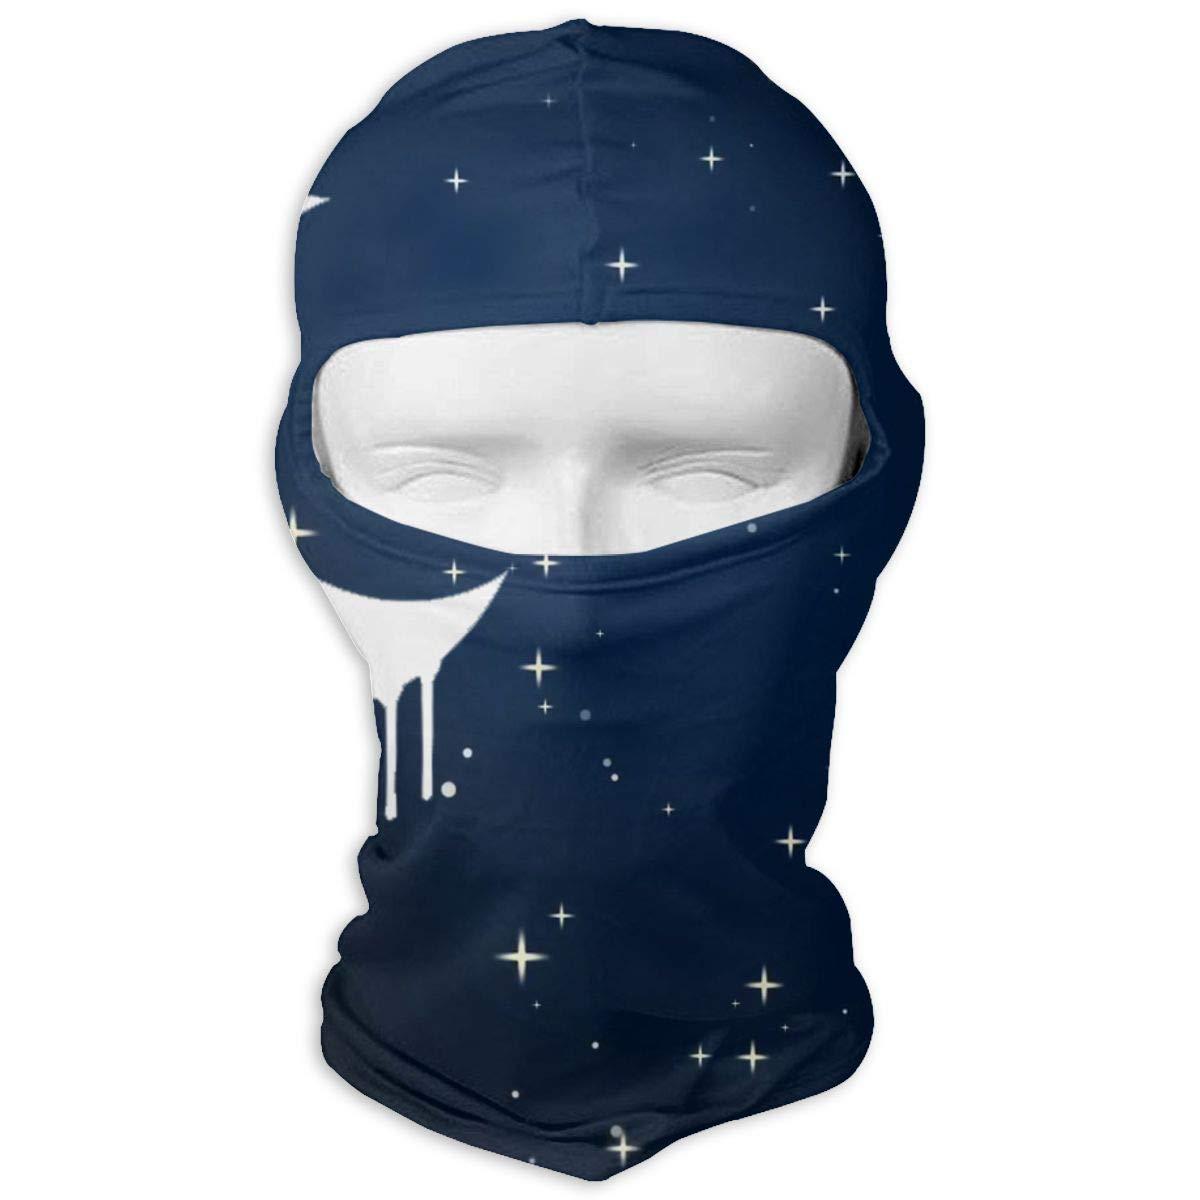 Goth Crescent Moon Full Face Mask Hood for Motorcycle Cycling Bike Hiking Skateboard Balaclava